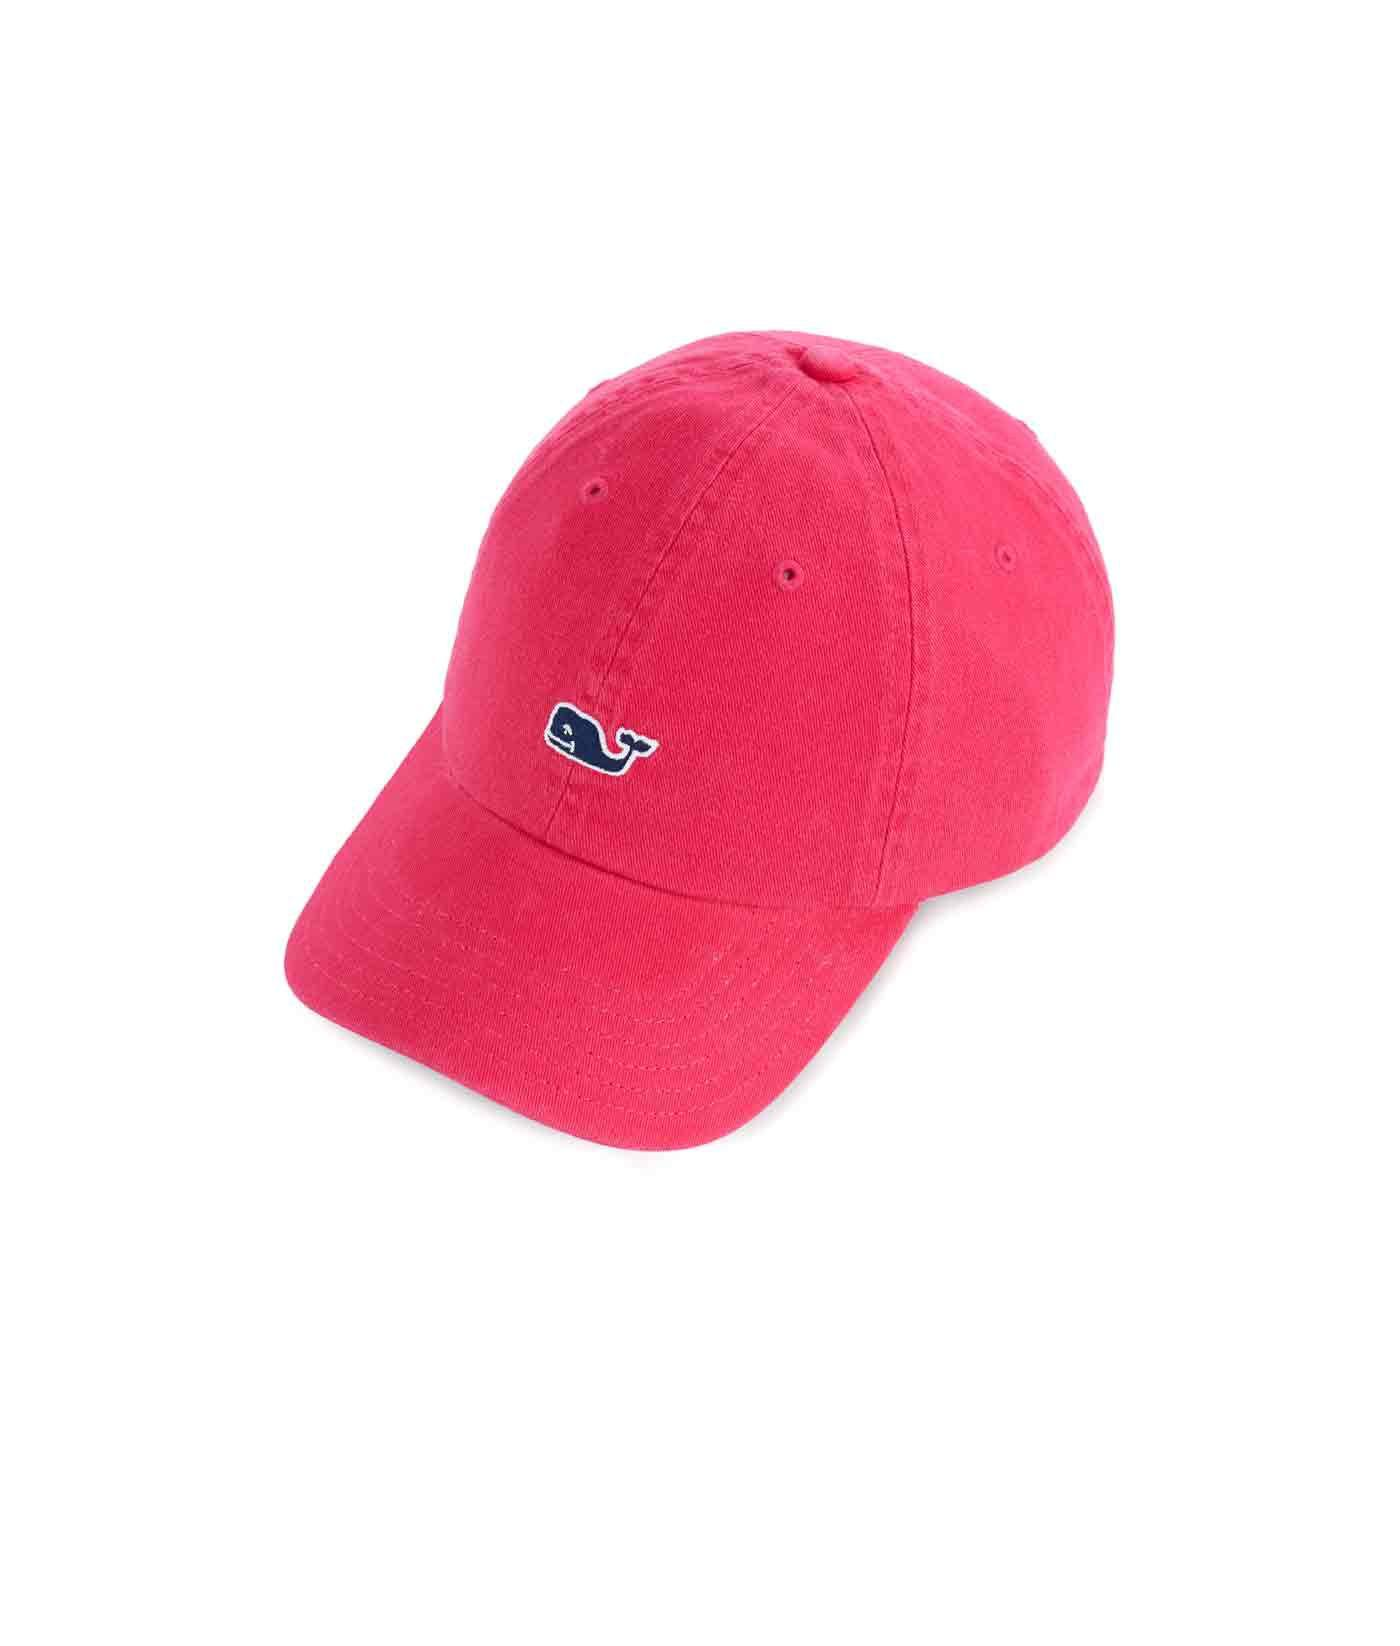 c42c999397b Lyst - Vineyard Vines Classic Twill Baseball Hat in Red